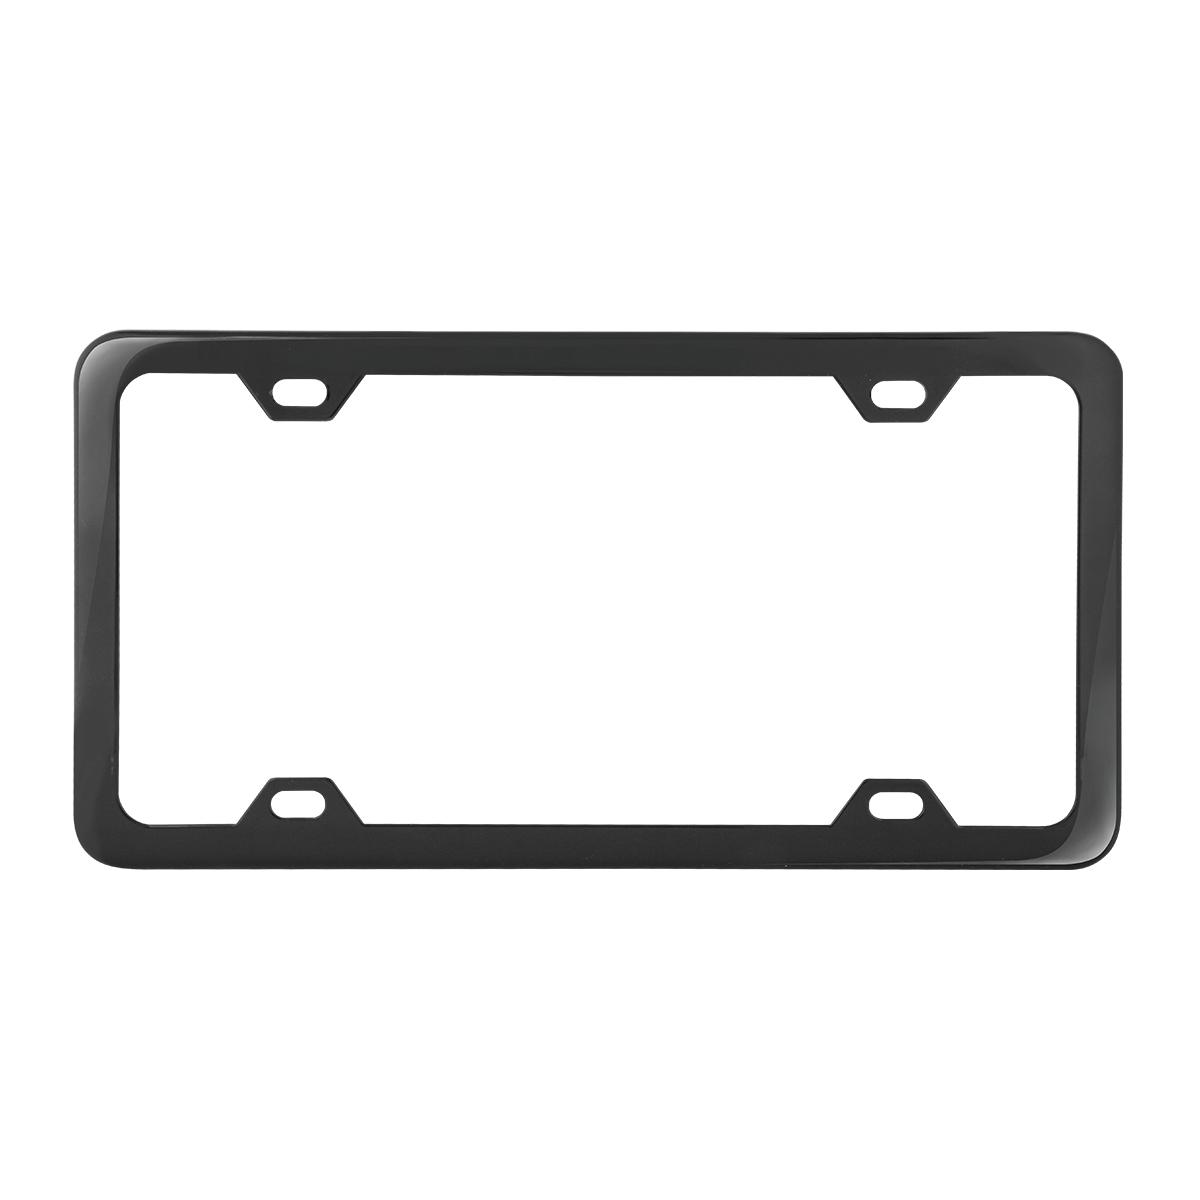 60415 Plain Semi-Gloss Black 4 Hole License Plate Frame